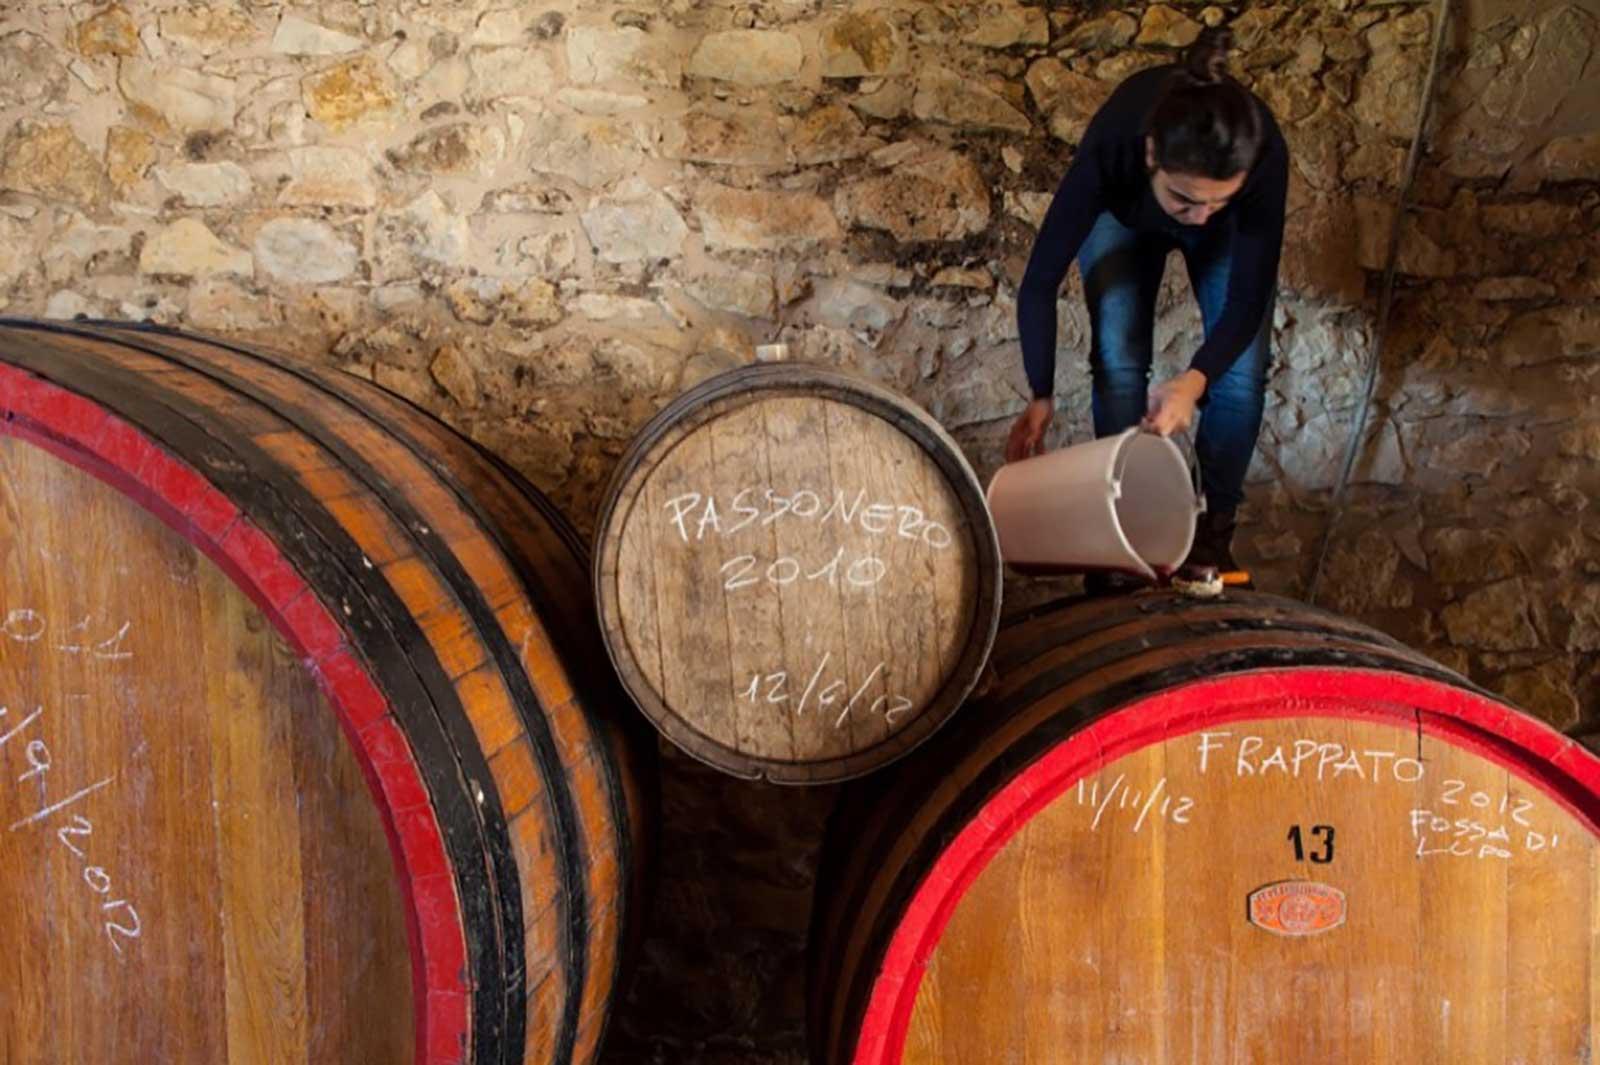 Arianna Occhipinti in her winery. ©Azienda Agricola Arianna Occhipinti